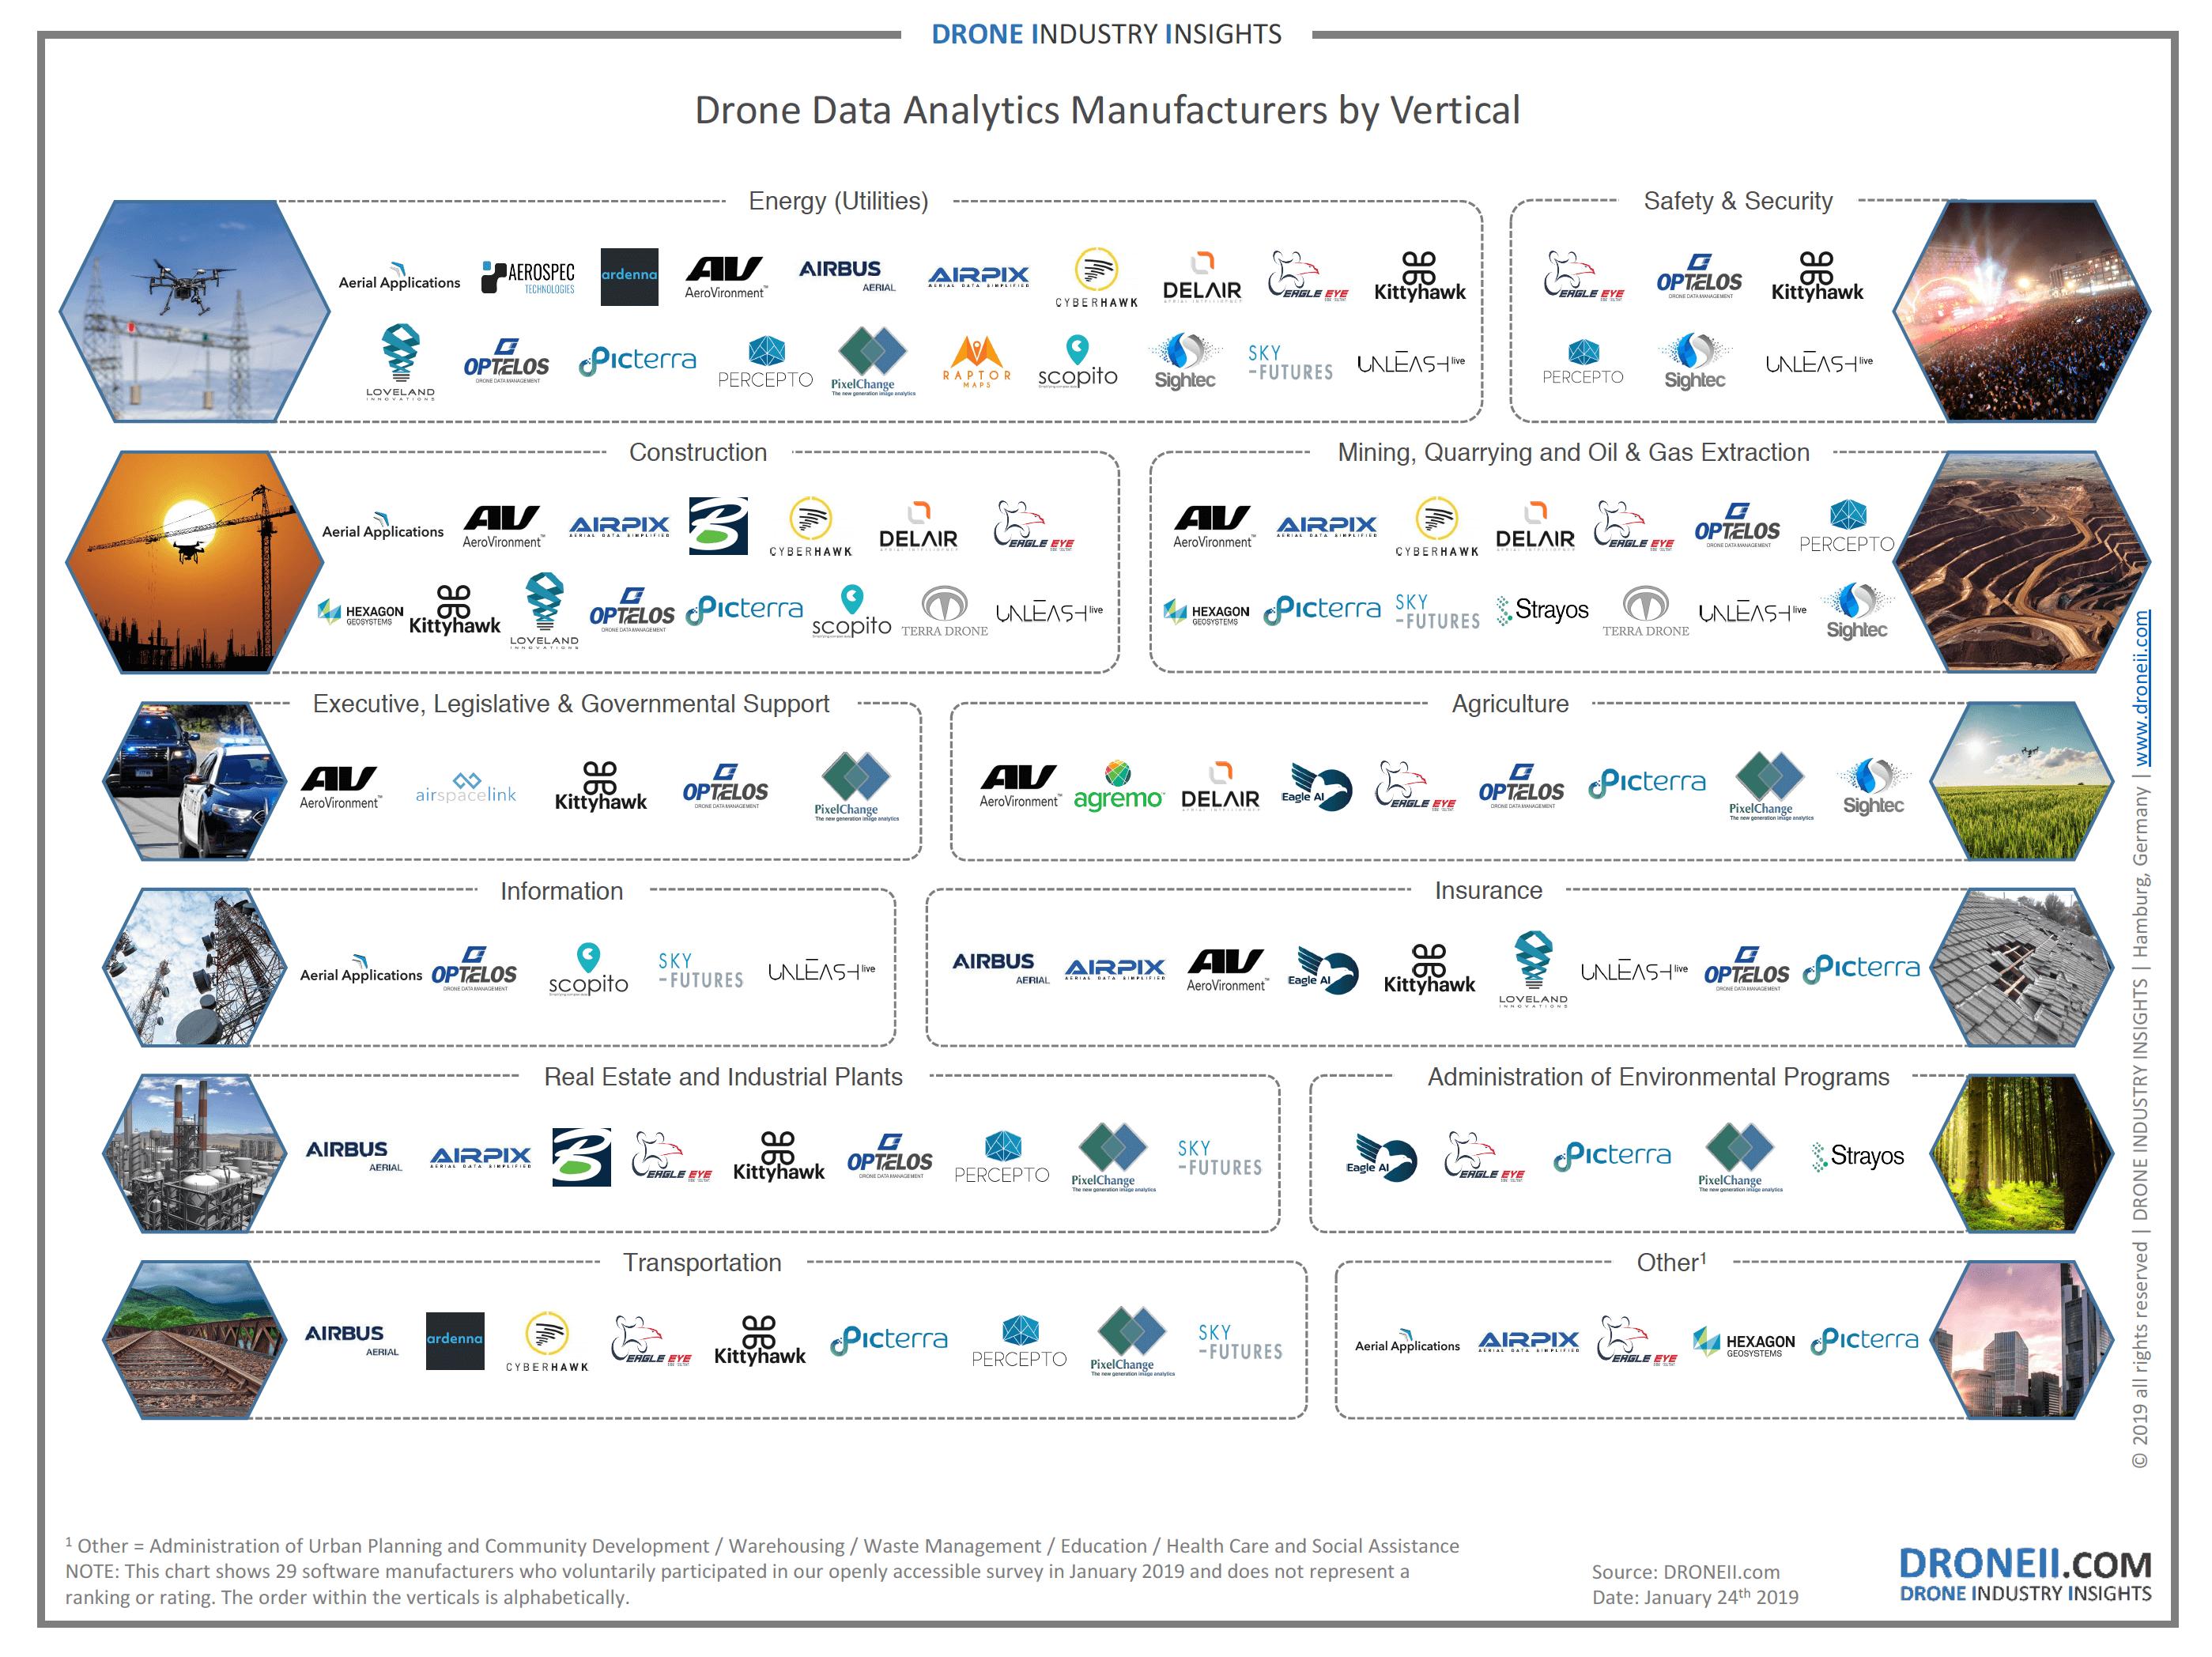 Drone Data Analytics Manufacturers